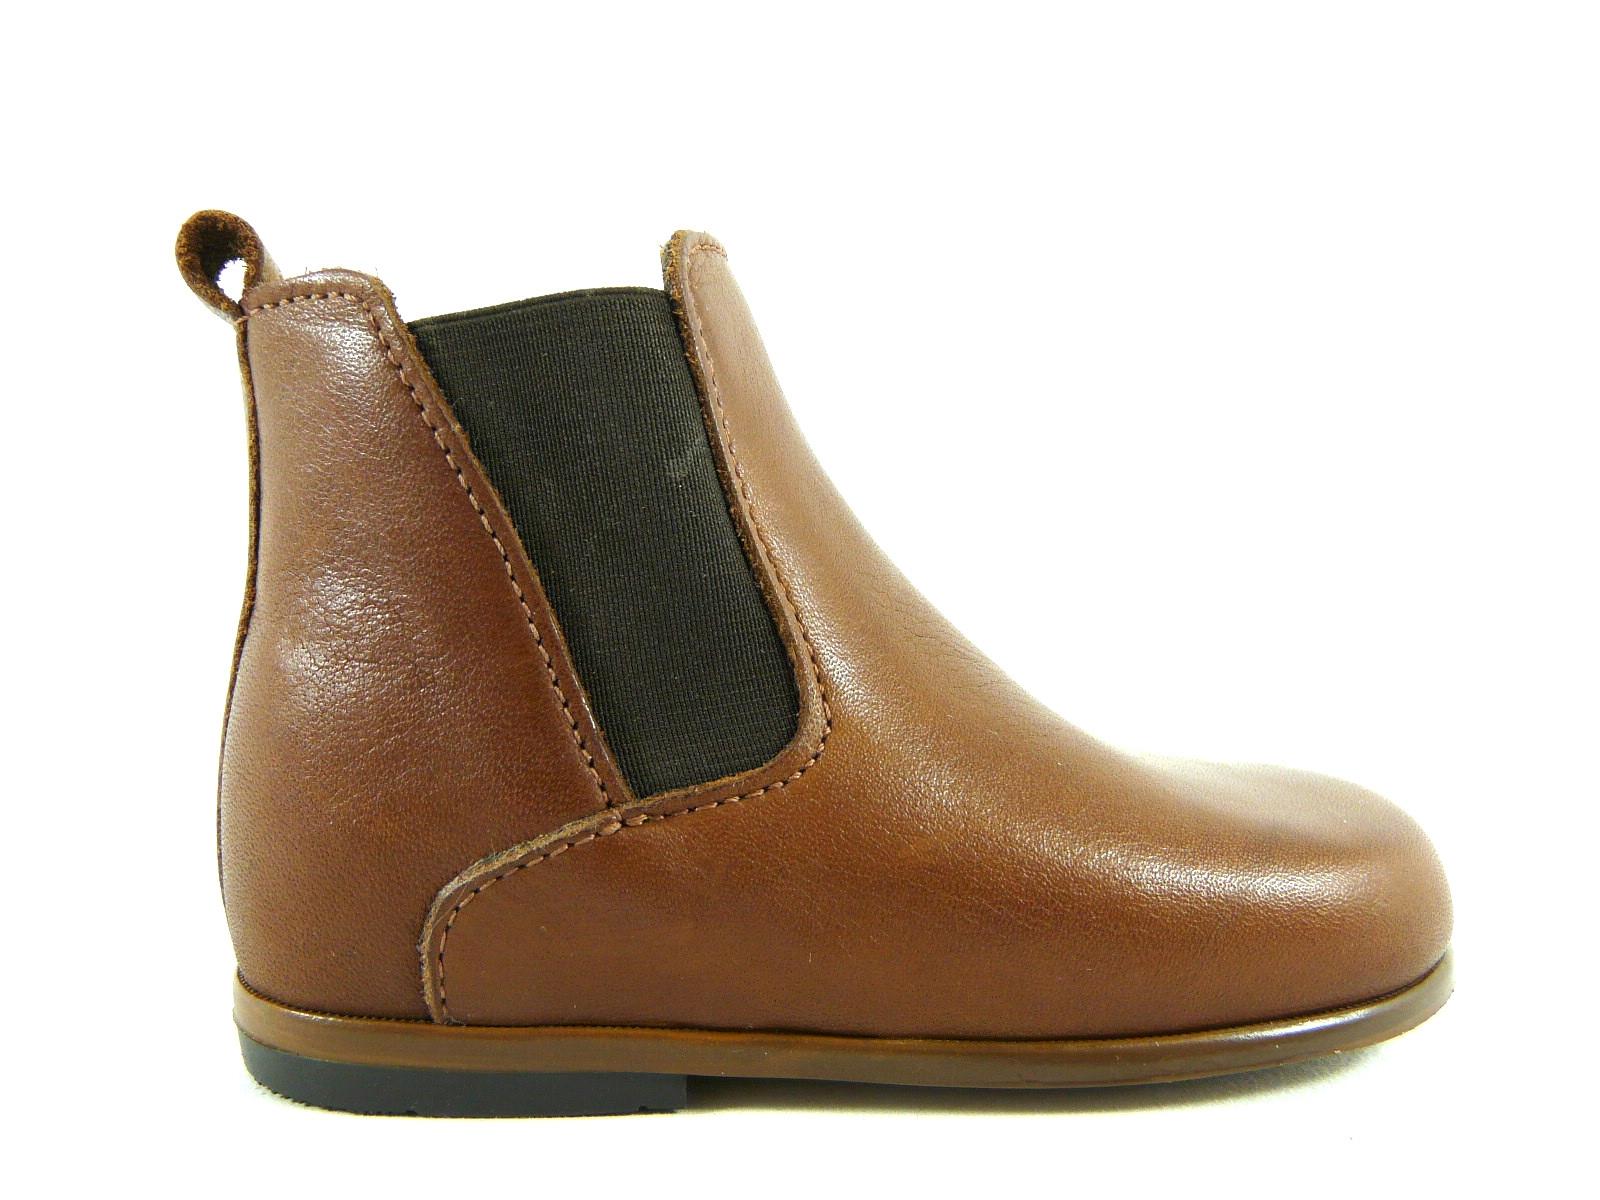 Aron Mary Chaussure Little Garcon Bottine Zip Cognac UzqMVSp